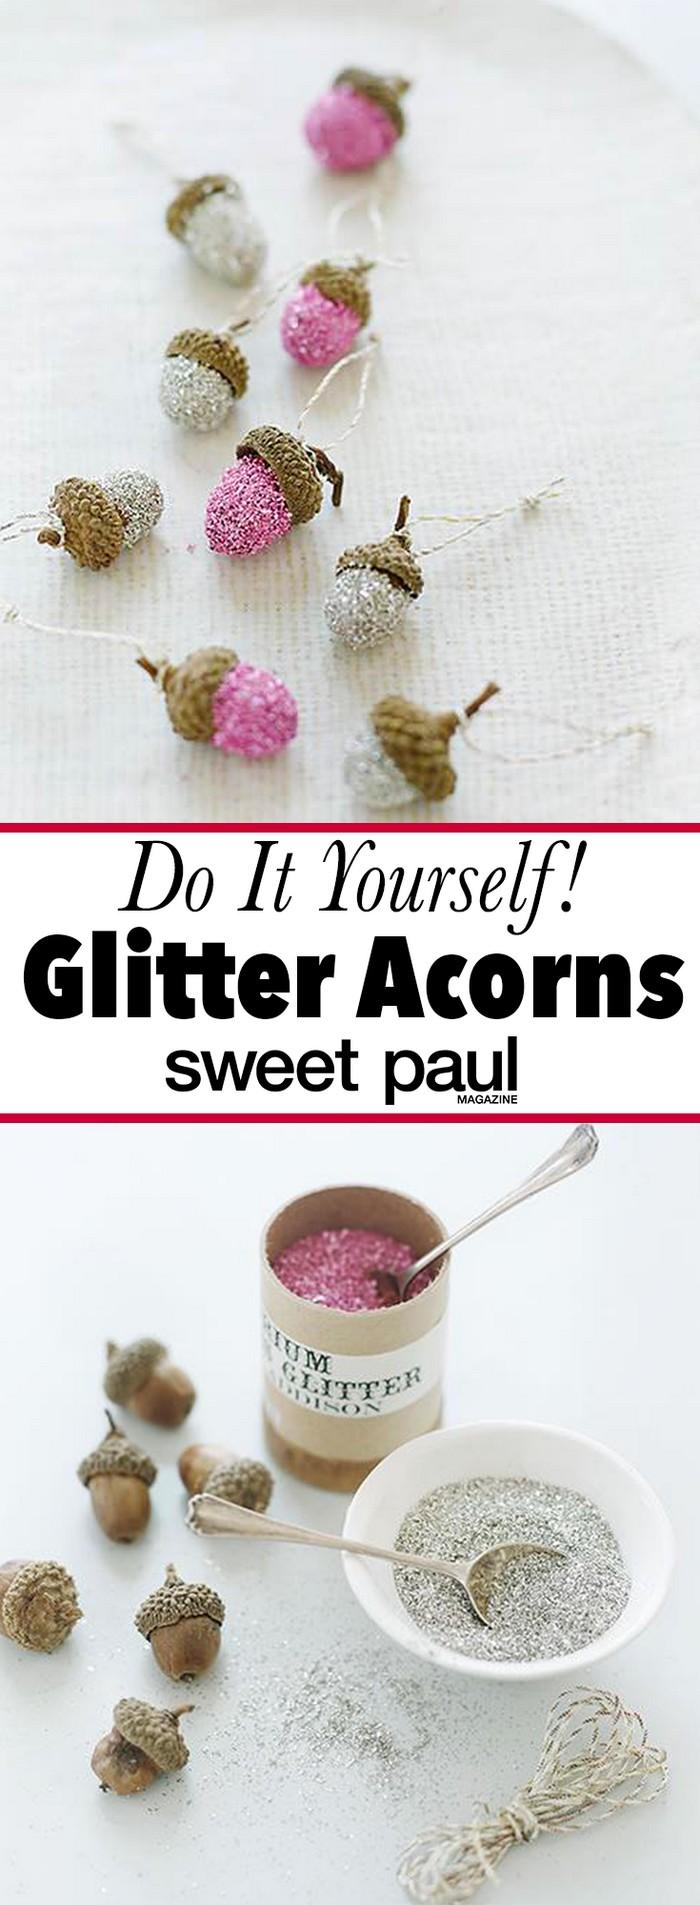 Glitter Acorns 25 Interesting Ideas to Make Easy Christmas Crafts